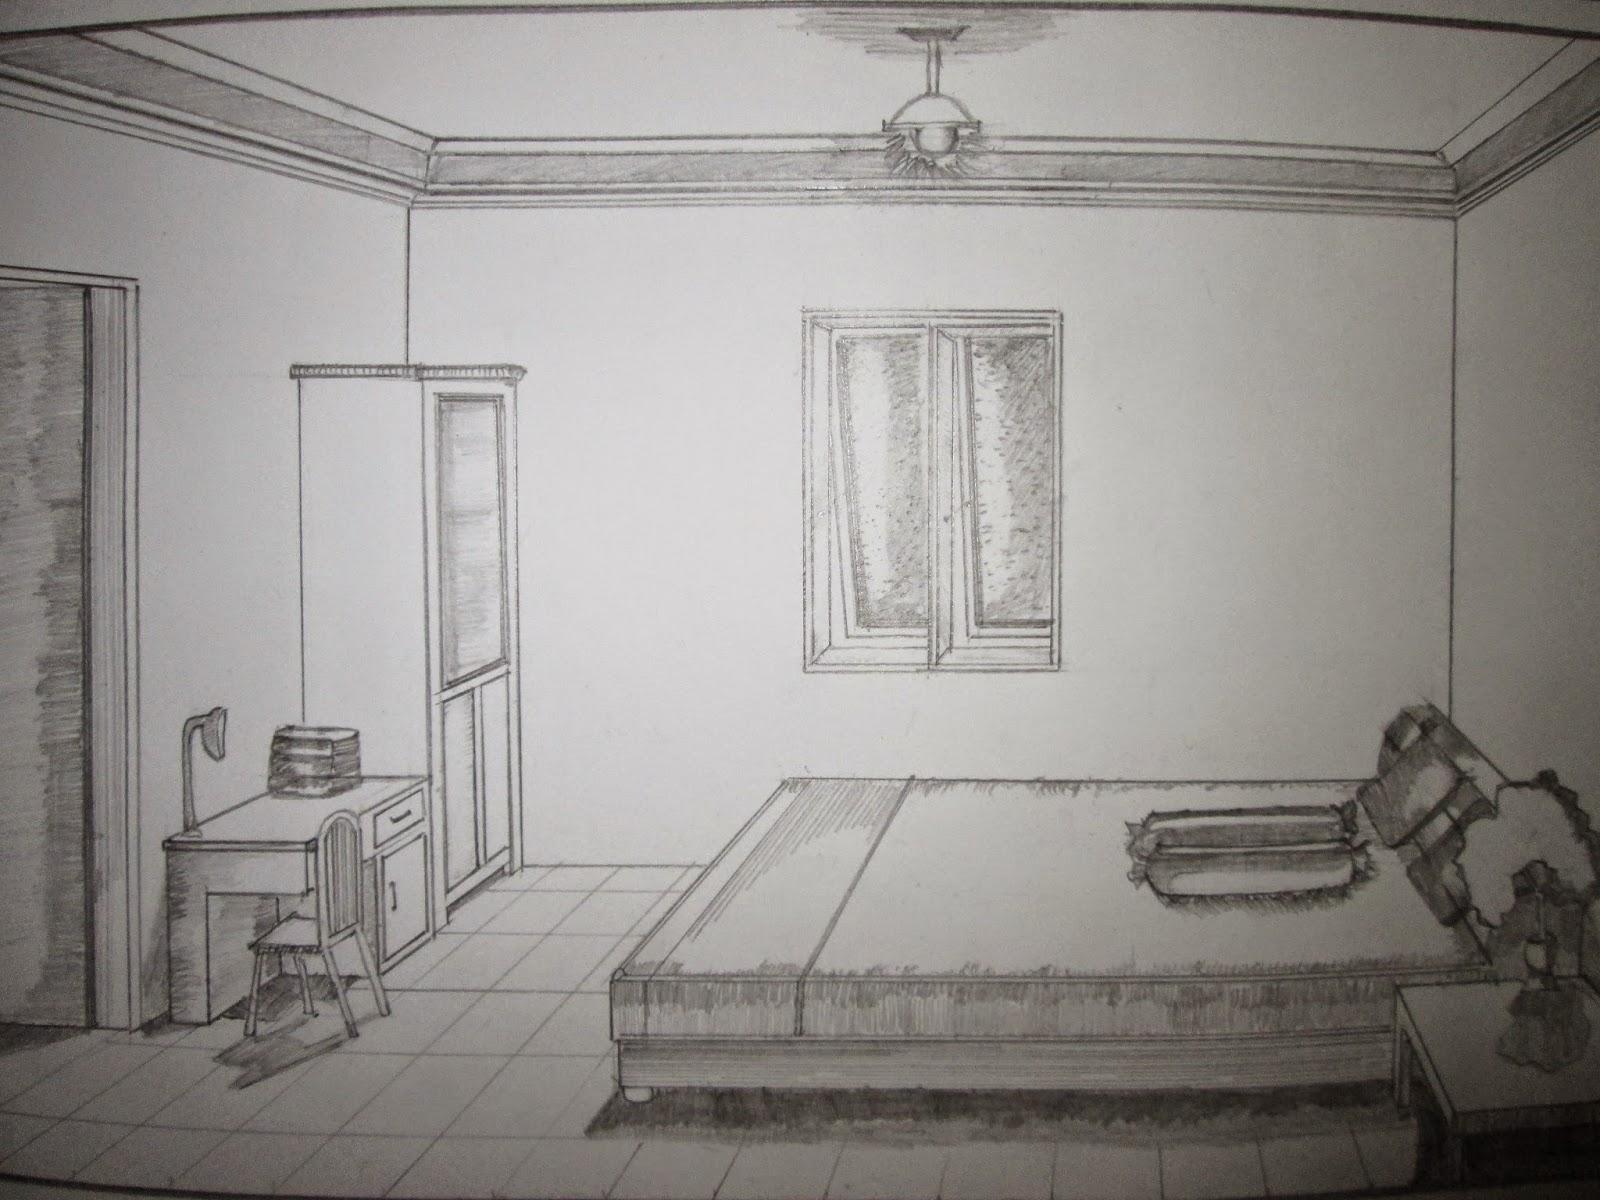 Kumpulan Sketsa Gambar Interior Kamar